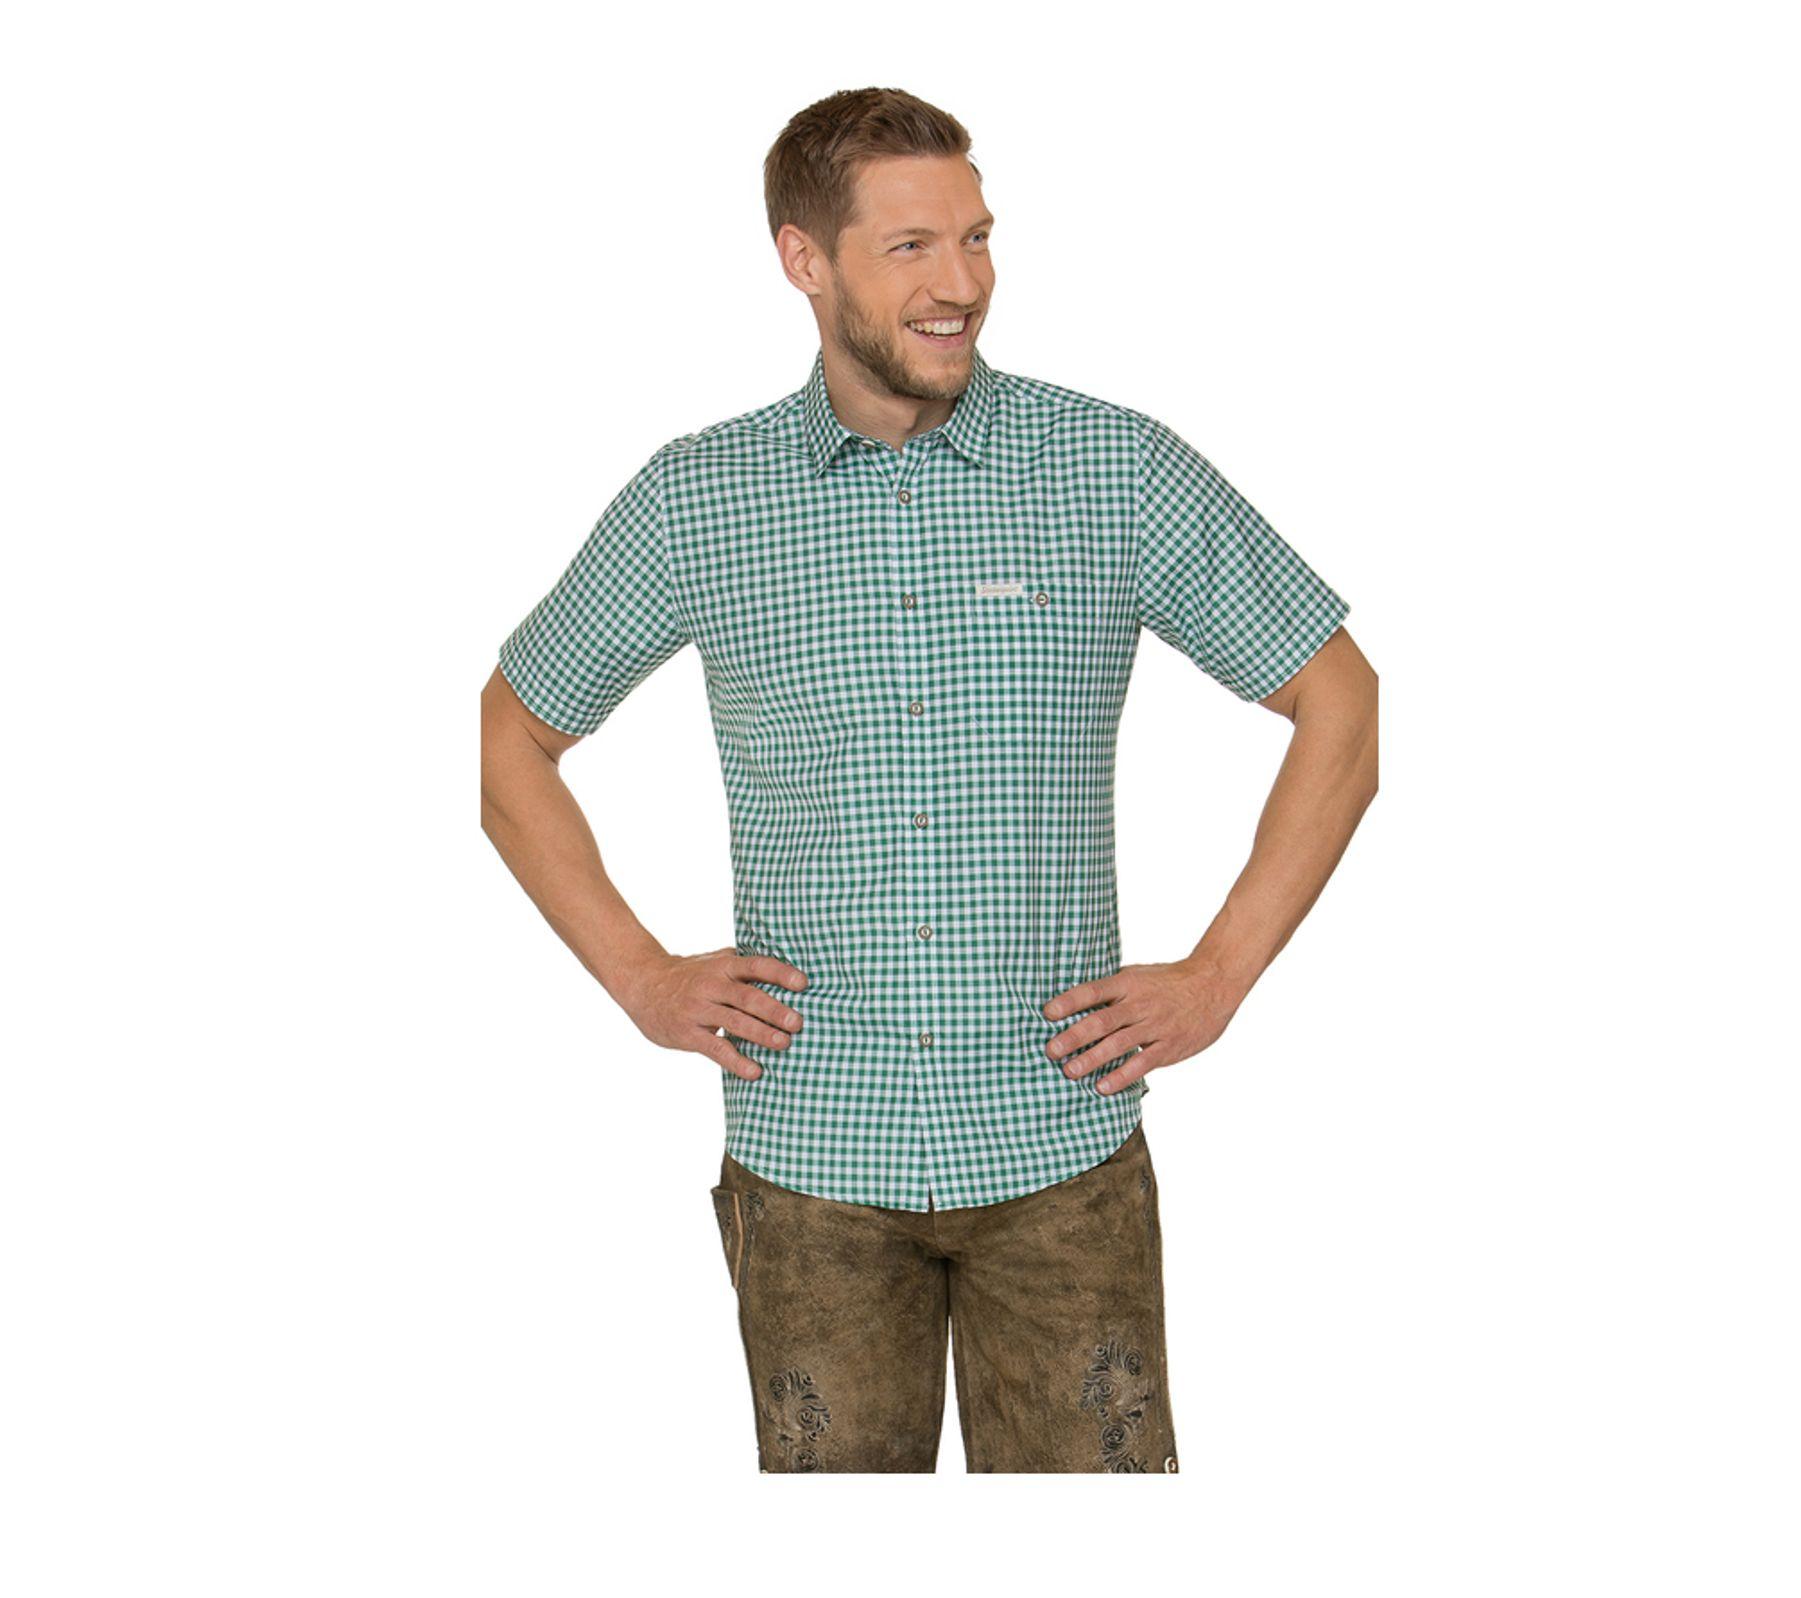 Stockerpoint - Herren kurzarm Trachtenhemd in verschiedenen Farben, Renko3 – Bild 17